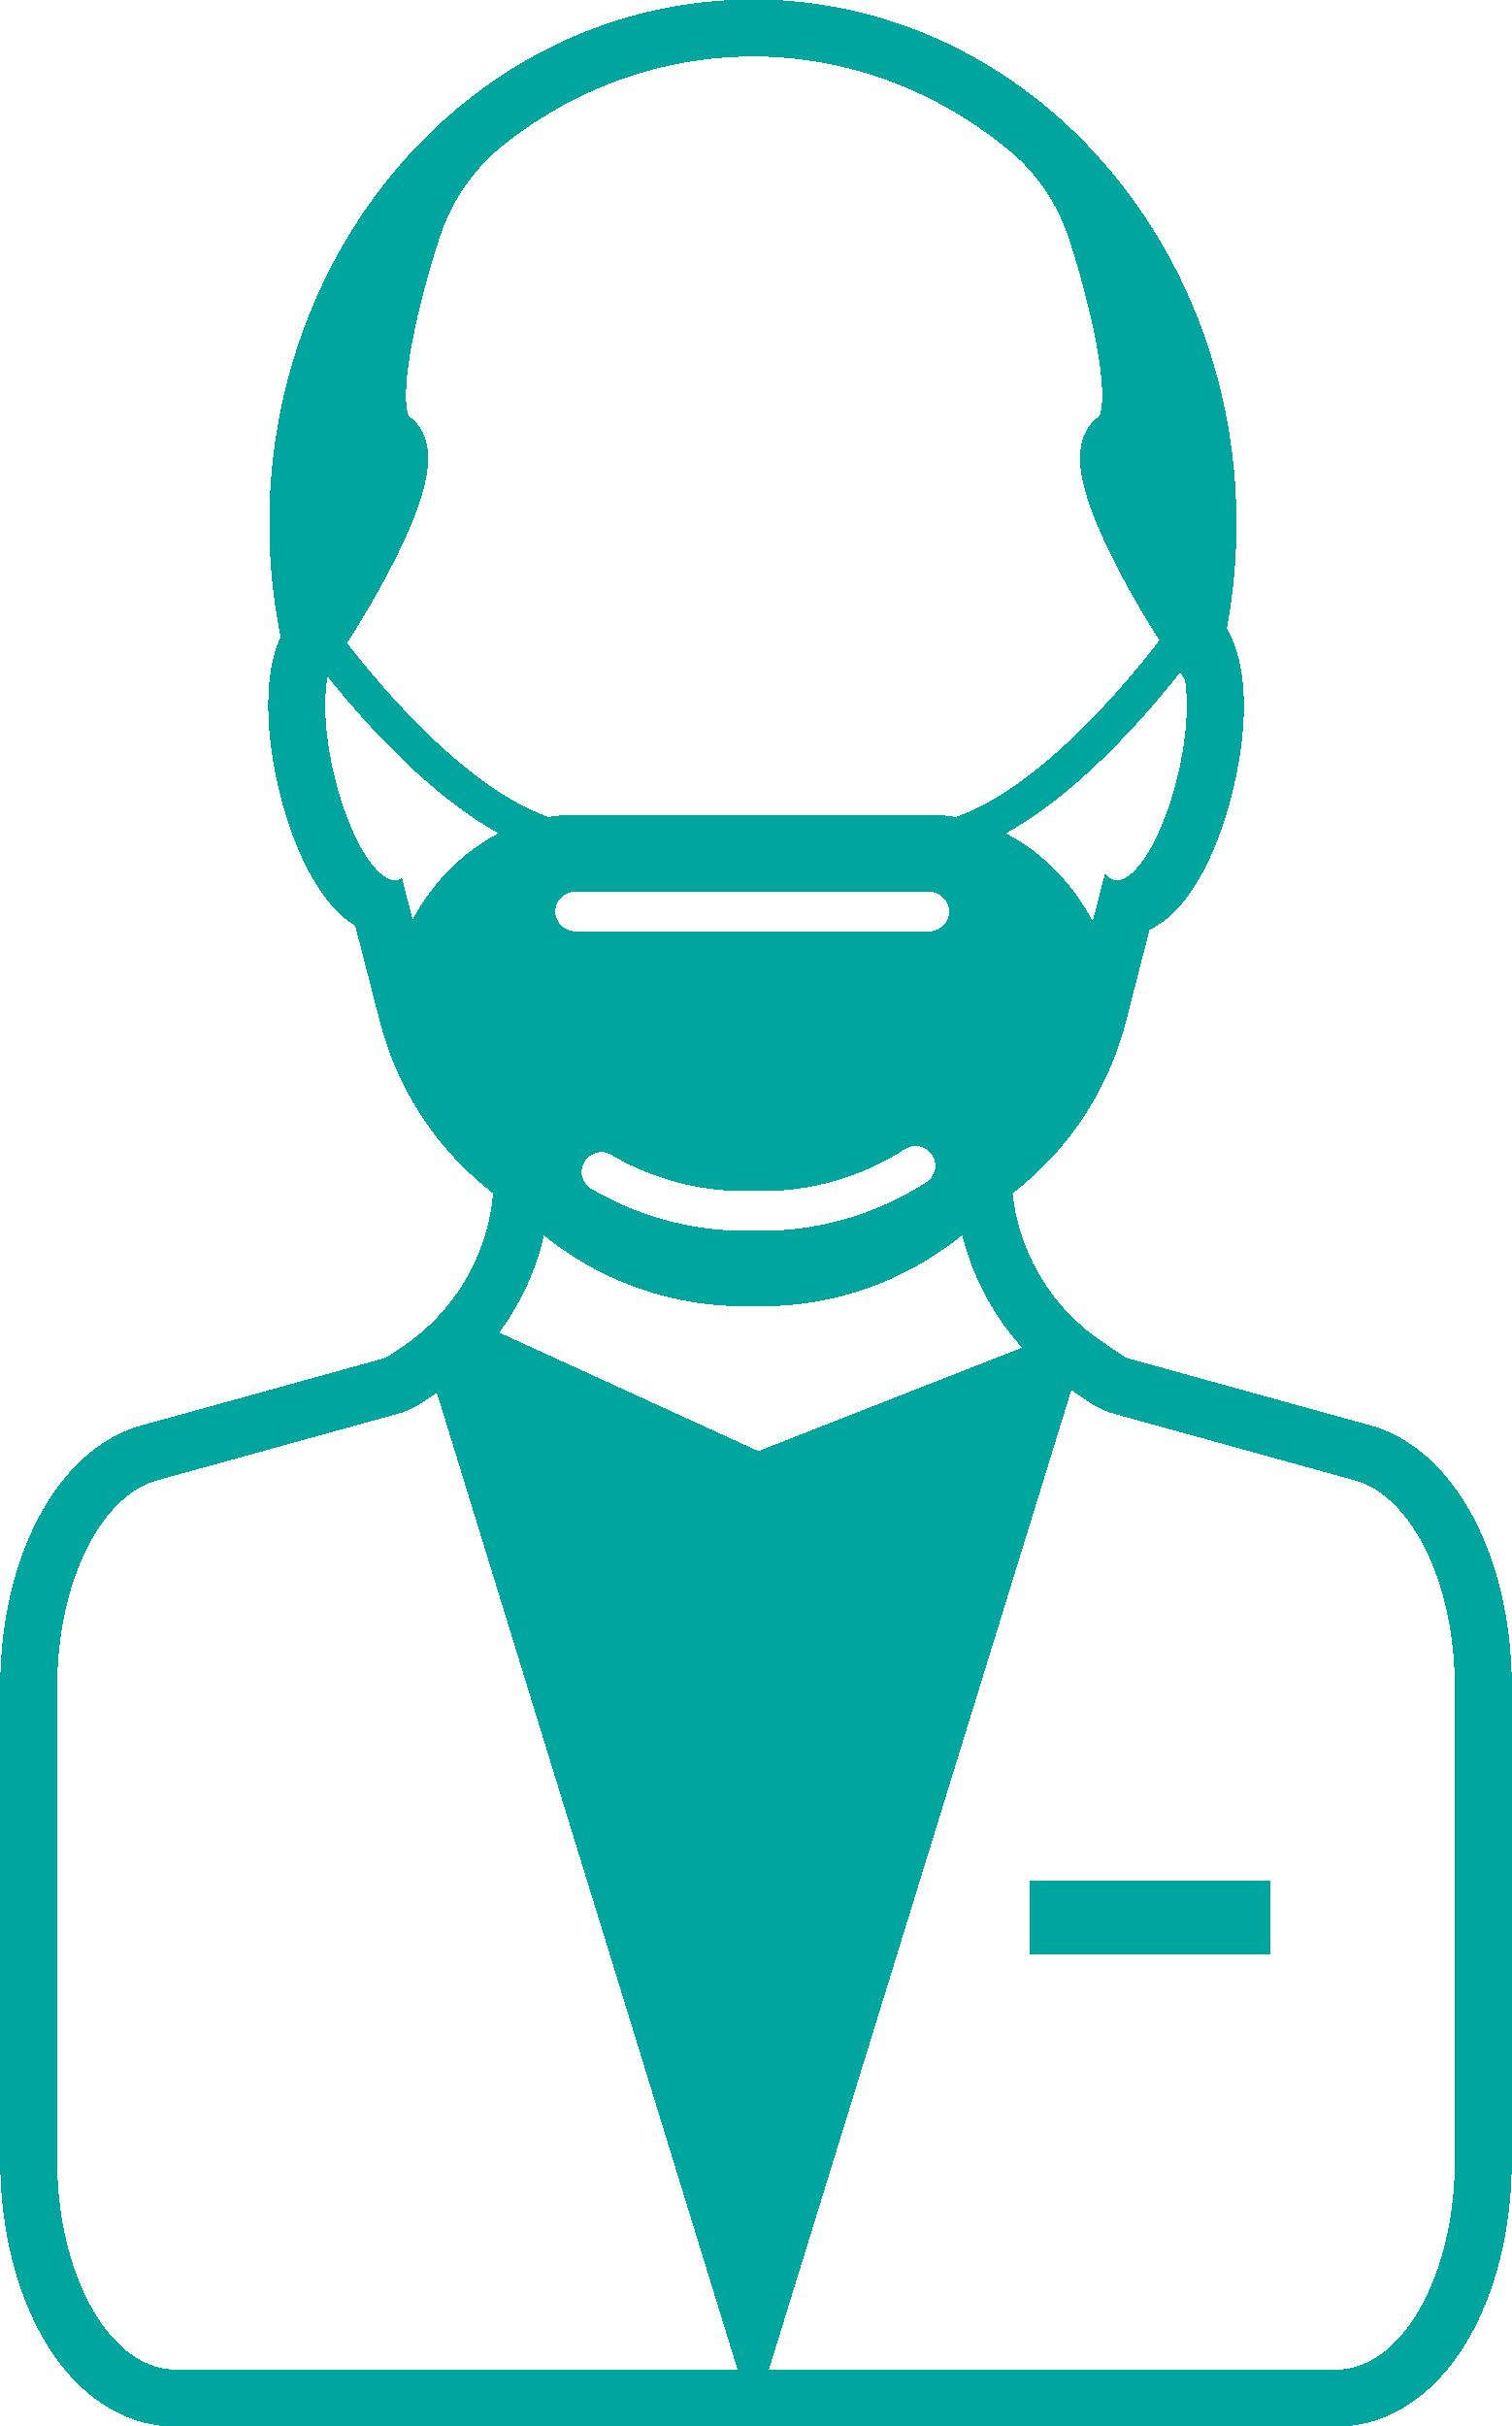 Man With Mask Coronavirus Disease covid-19 Free DXF File